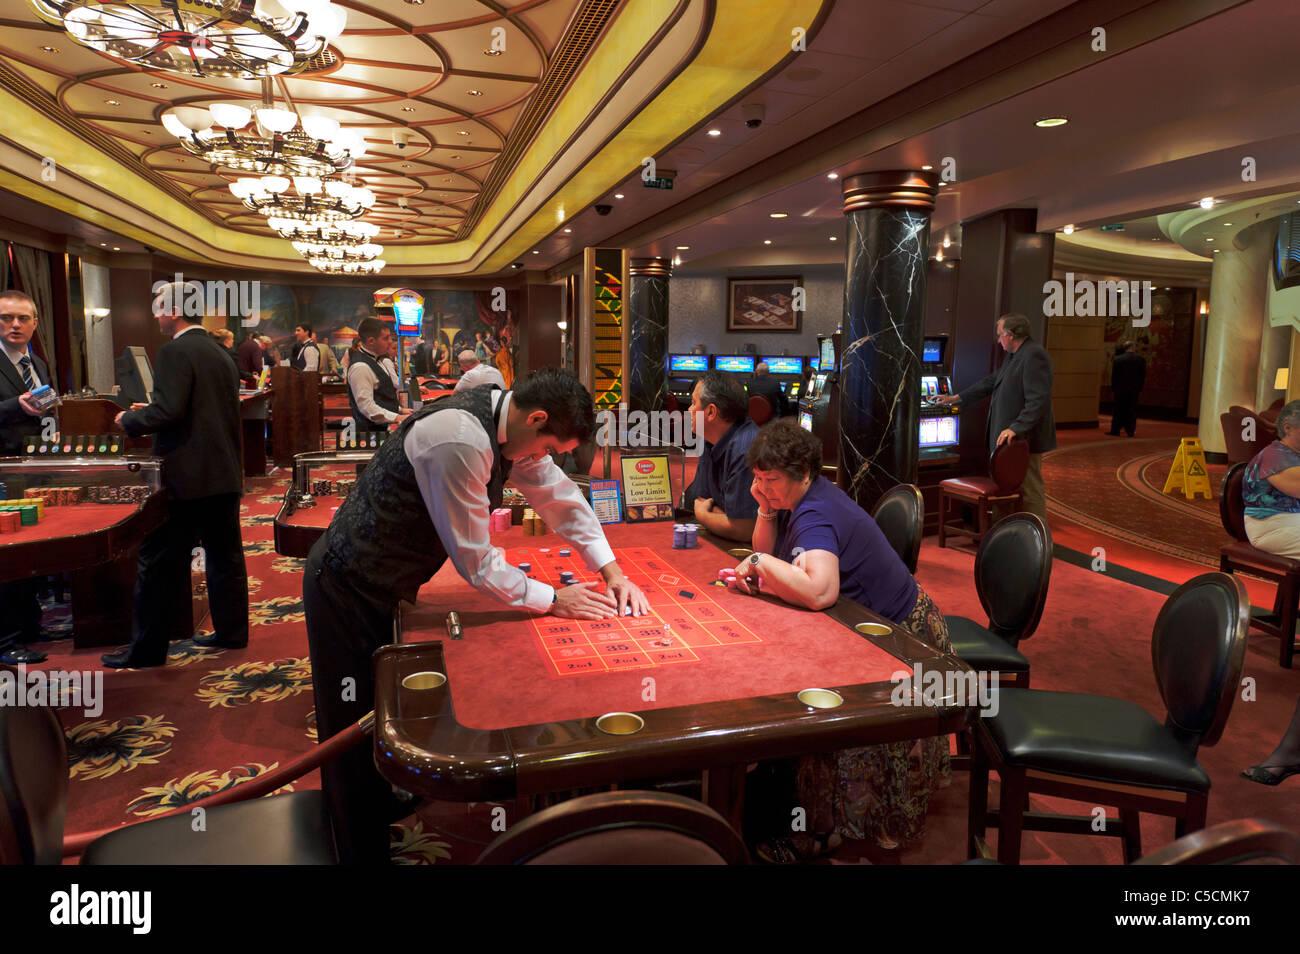 Две казино казино арбат на новом арбате